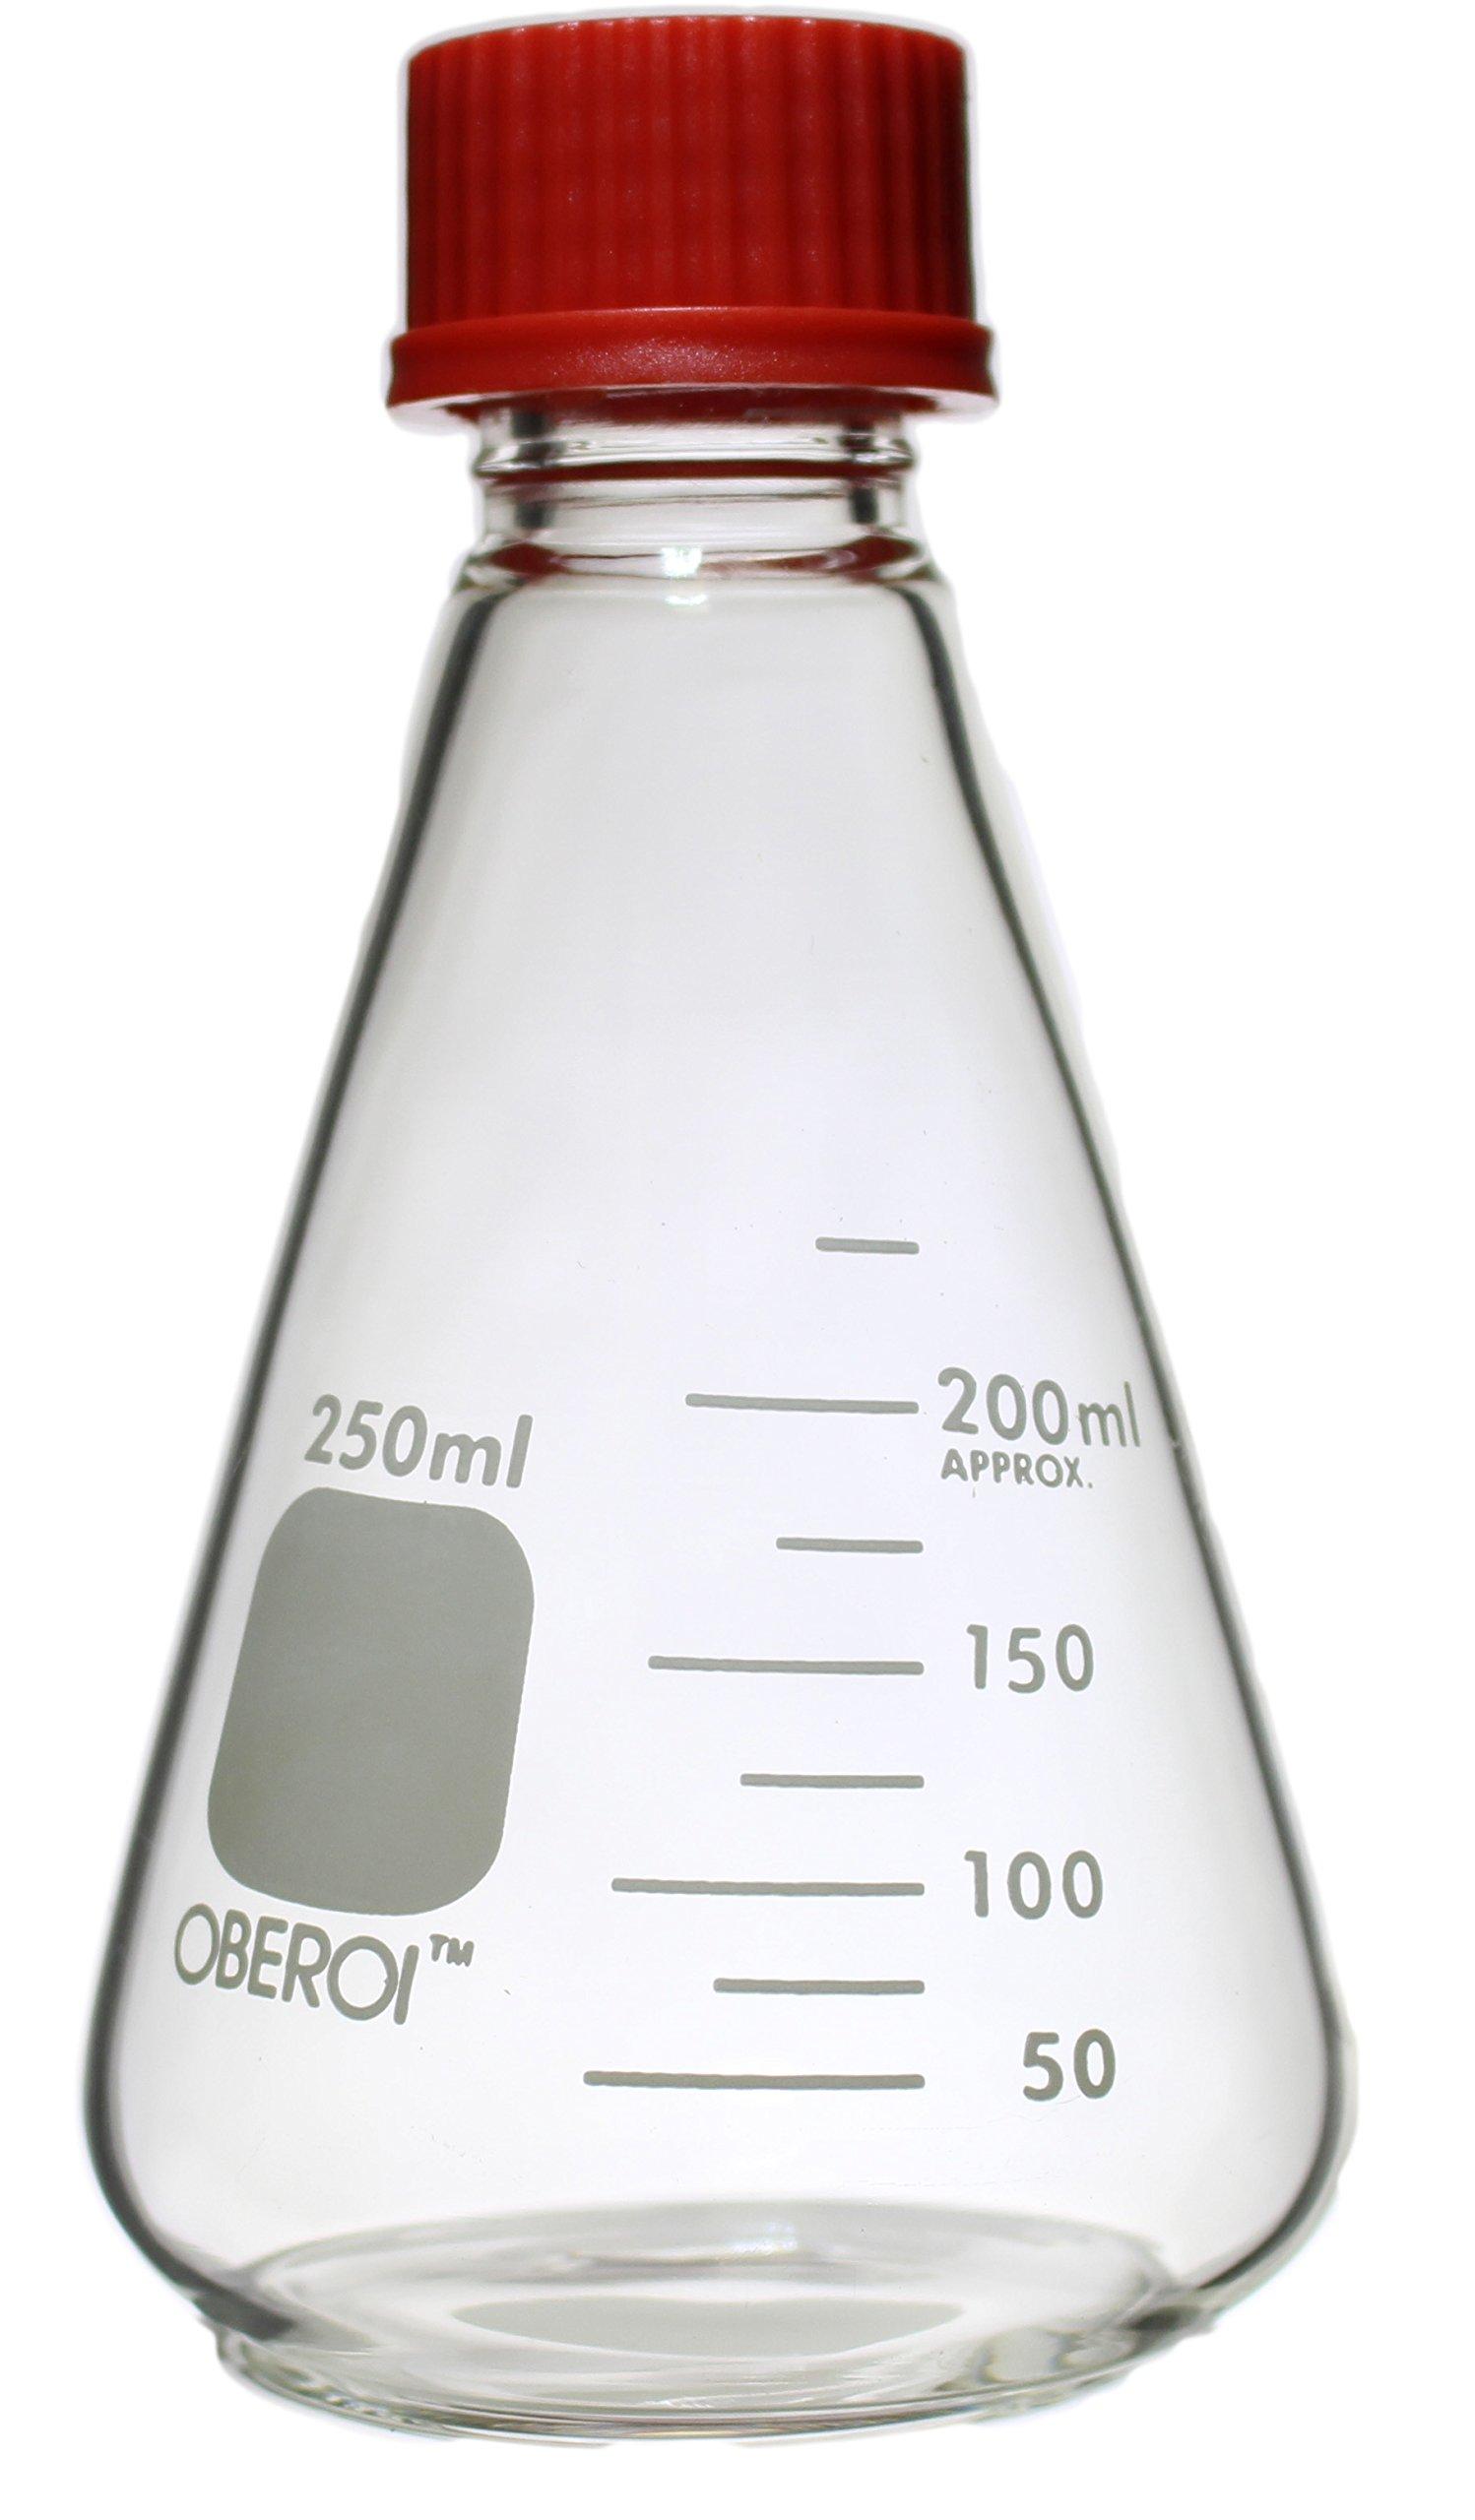 Erlenmeyer Flasks with Screw Caps Set, 1000 mL, 500mL, 250 mL, 100 mL, Graduated Borosilicate 3.3 Glass by Oberoi Laborglas (Image #3)